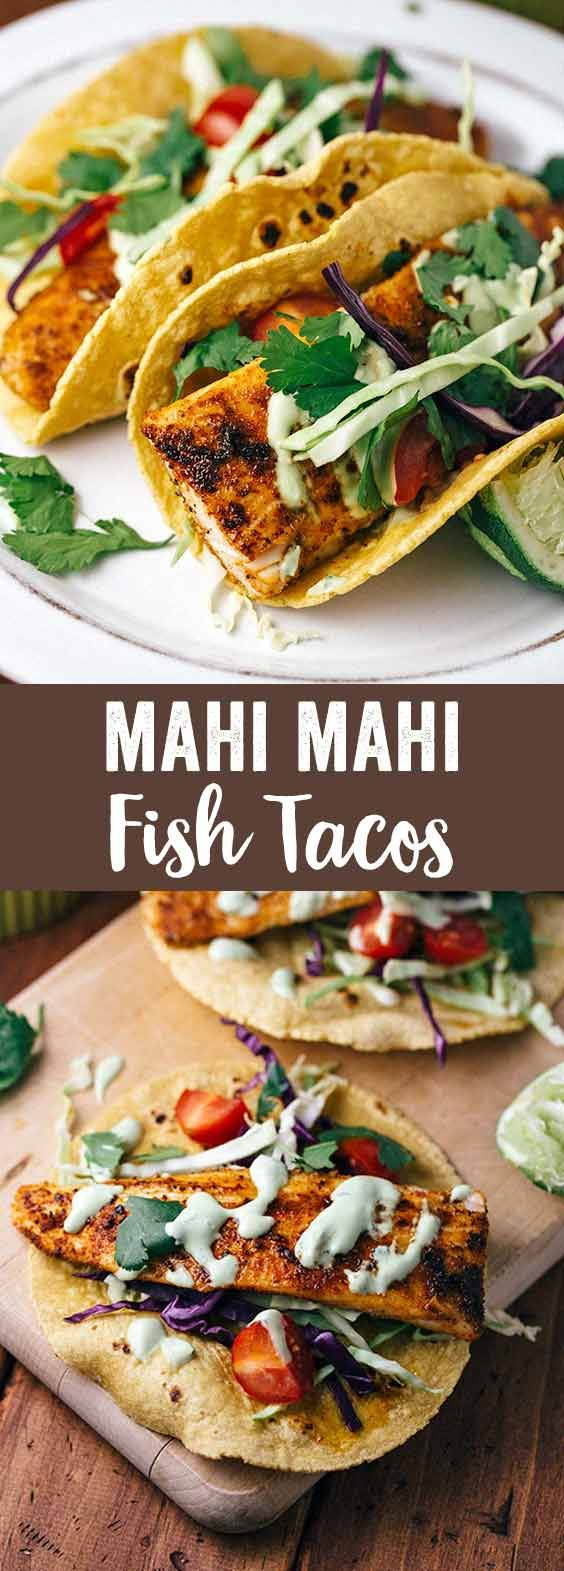 Blackened Mahi Mahi Fish Tacos with Avocado-Lime Sauce - A super simple and flavorful recipe that you won't need to head to Mexico to enjoy! via @foodiegavin